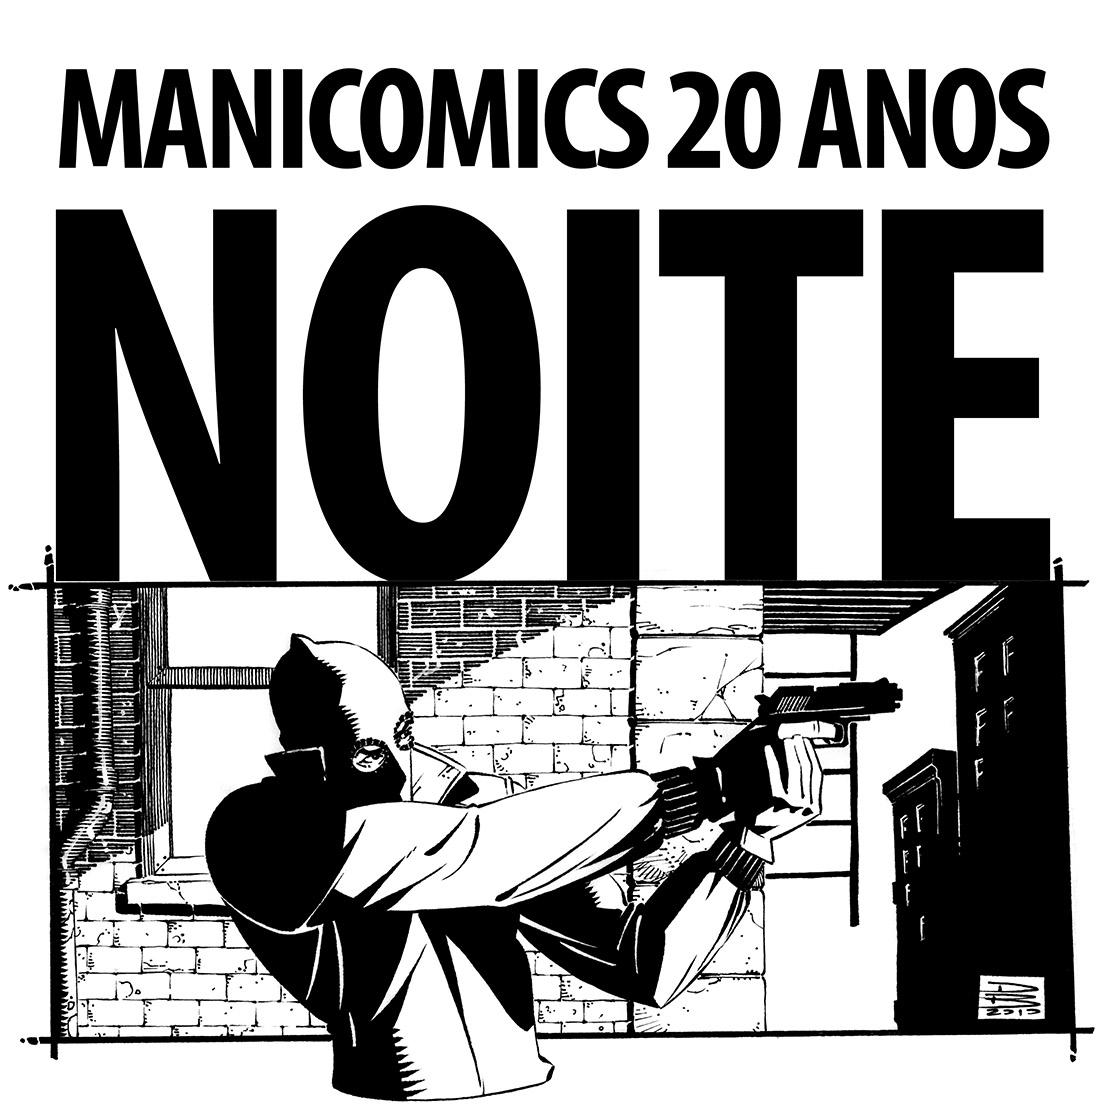 Noite_manicomics_20_Anos web instagram